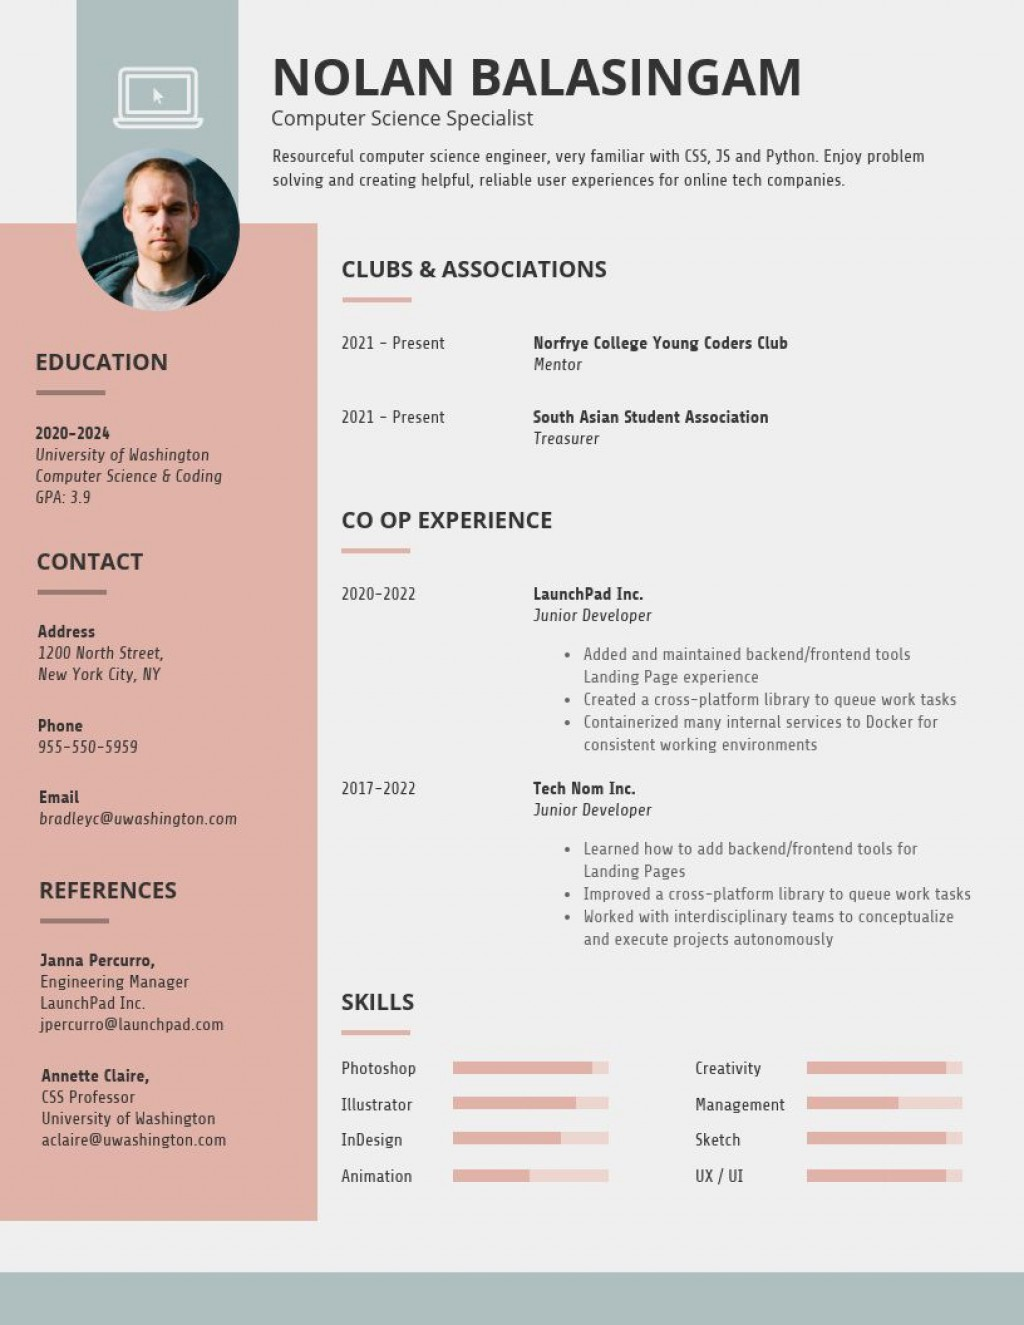 001 Wondrou Basic Student Resume Template High Def  Templates School Google DocLarge